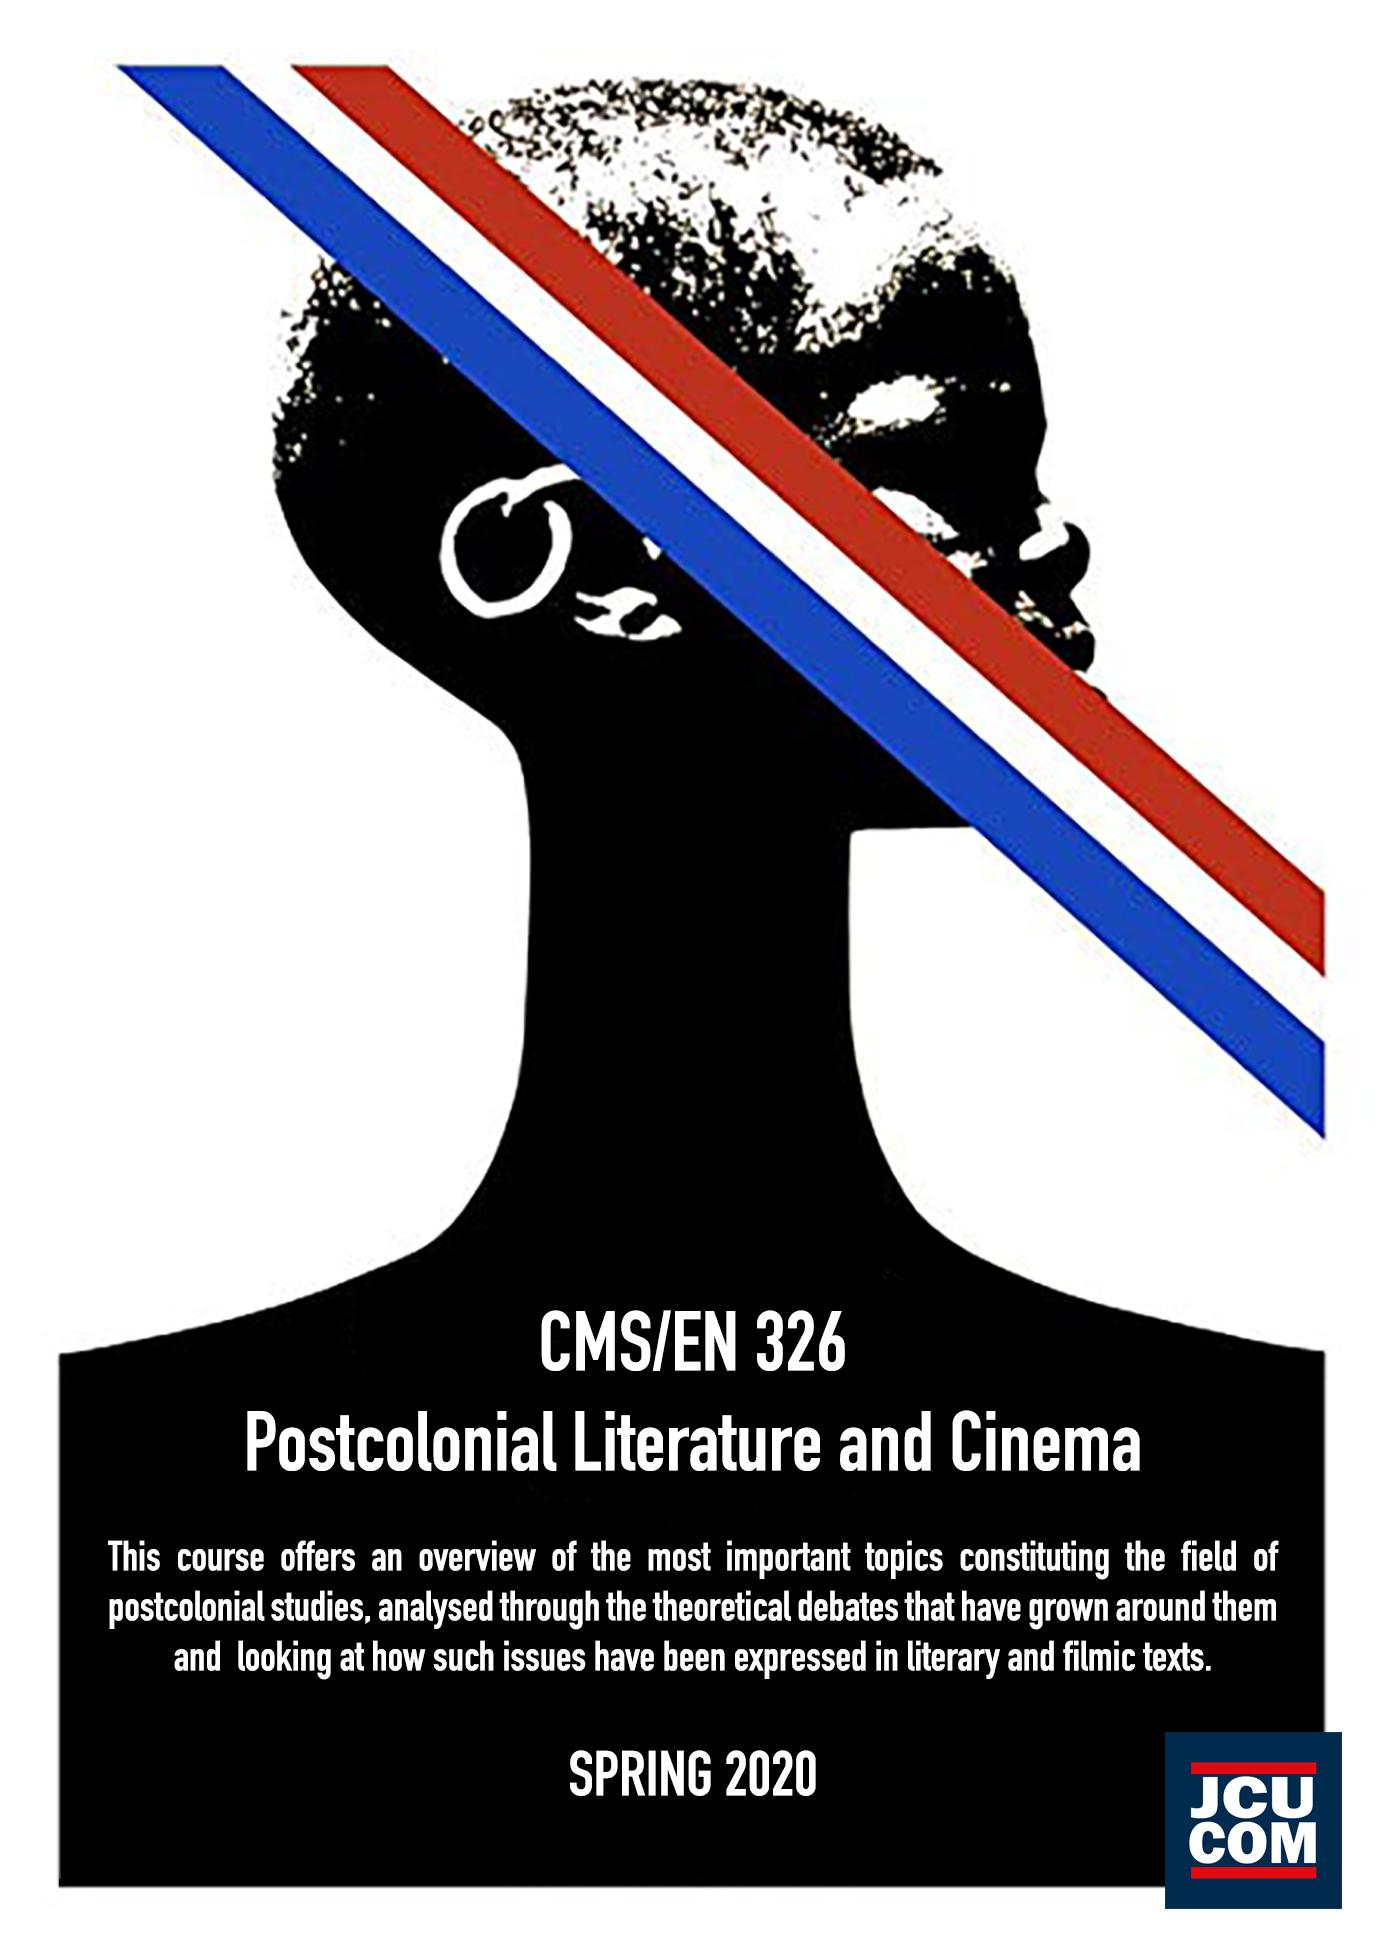 CMS-EN 326 - Postcolonial Cinema and Literature